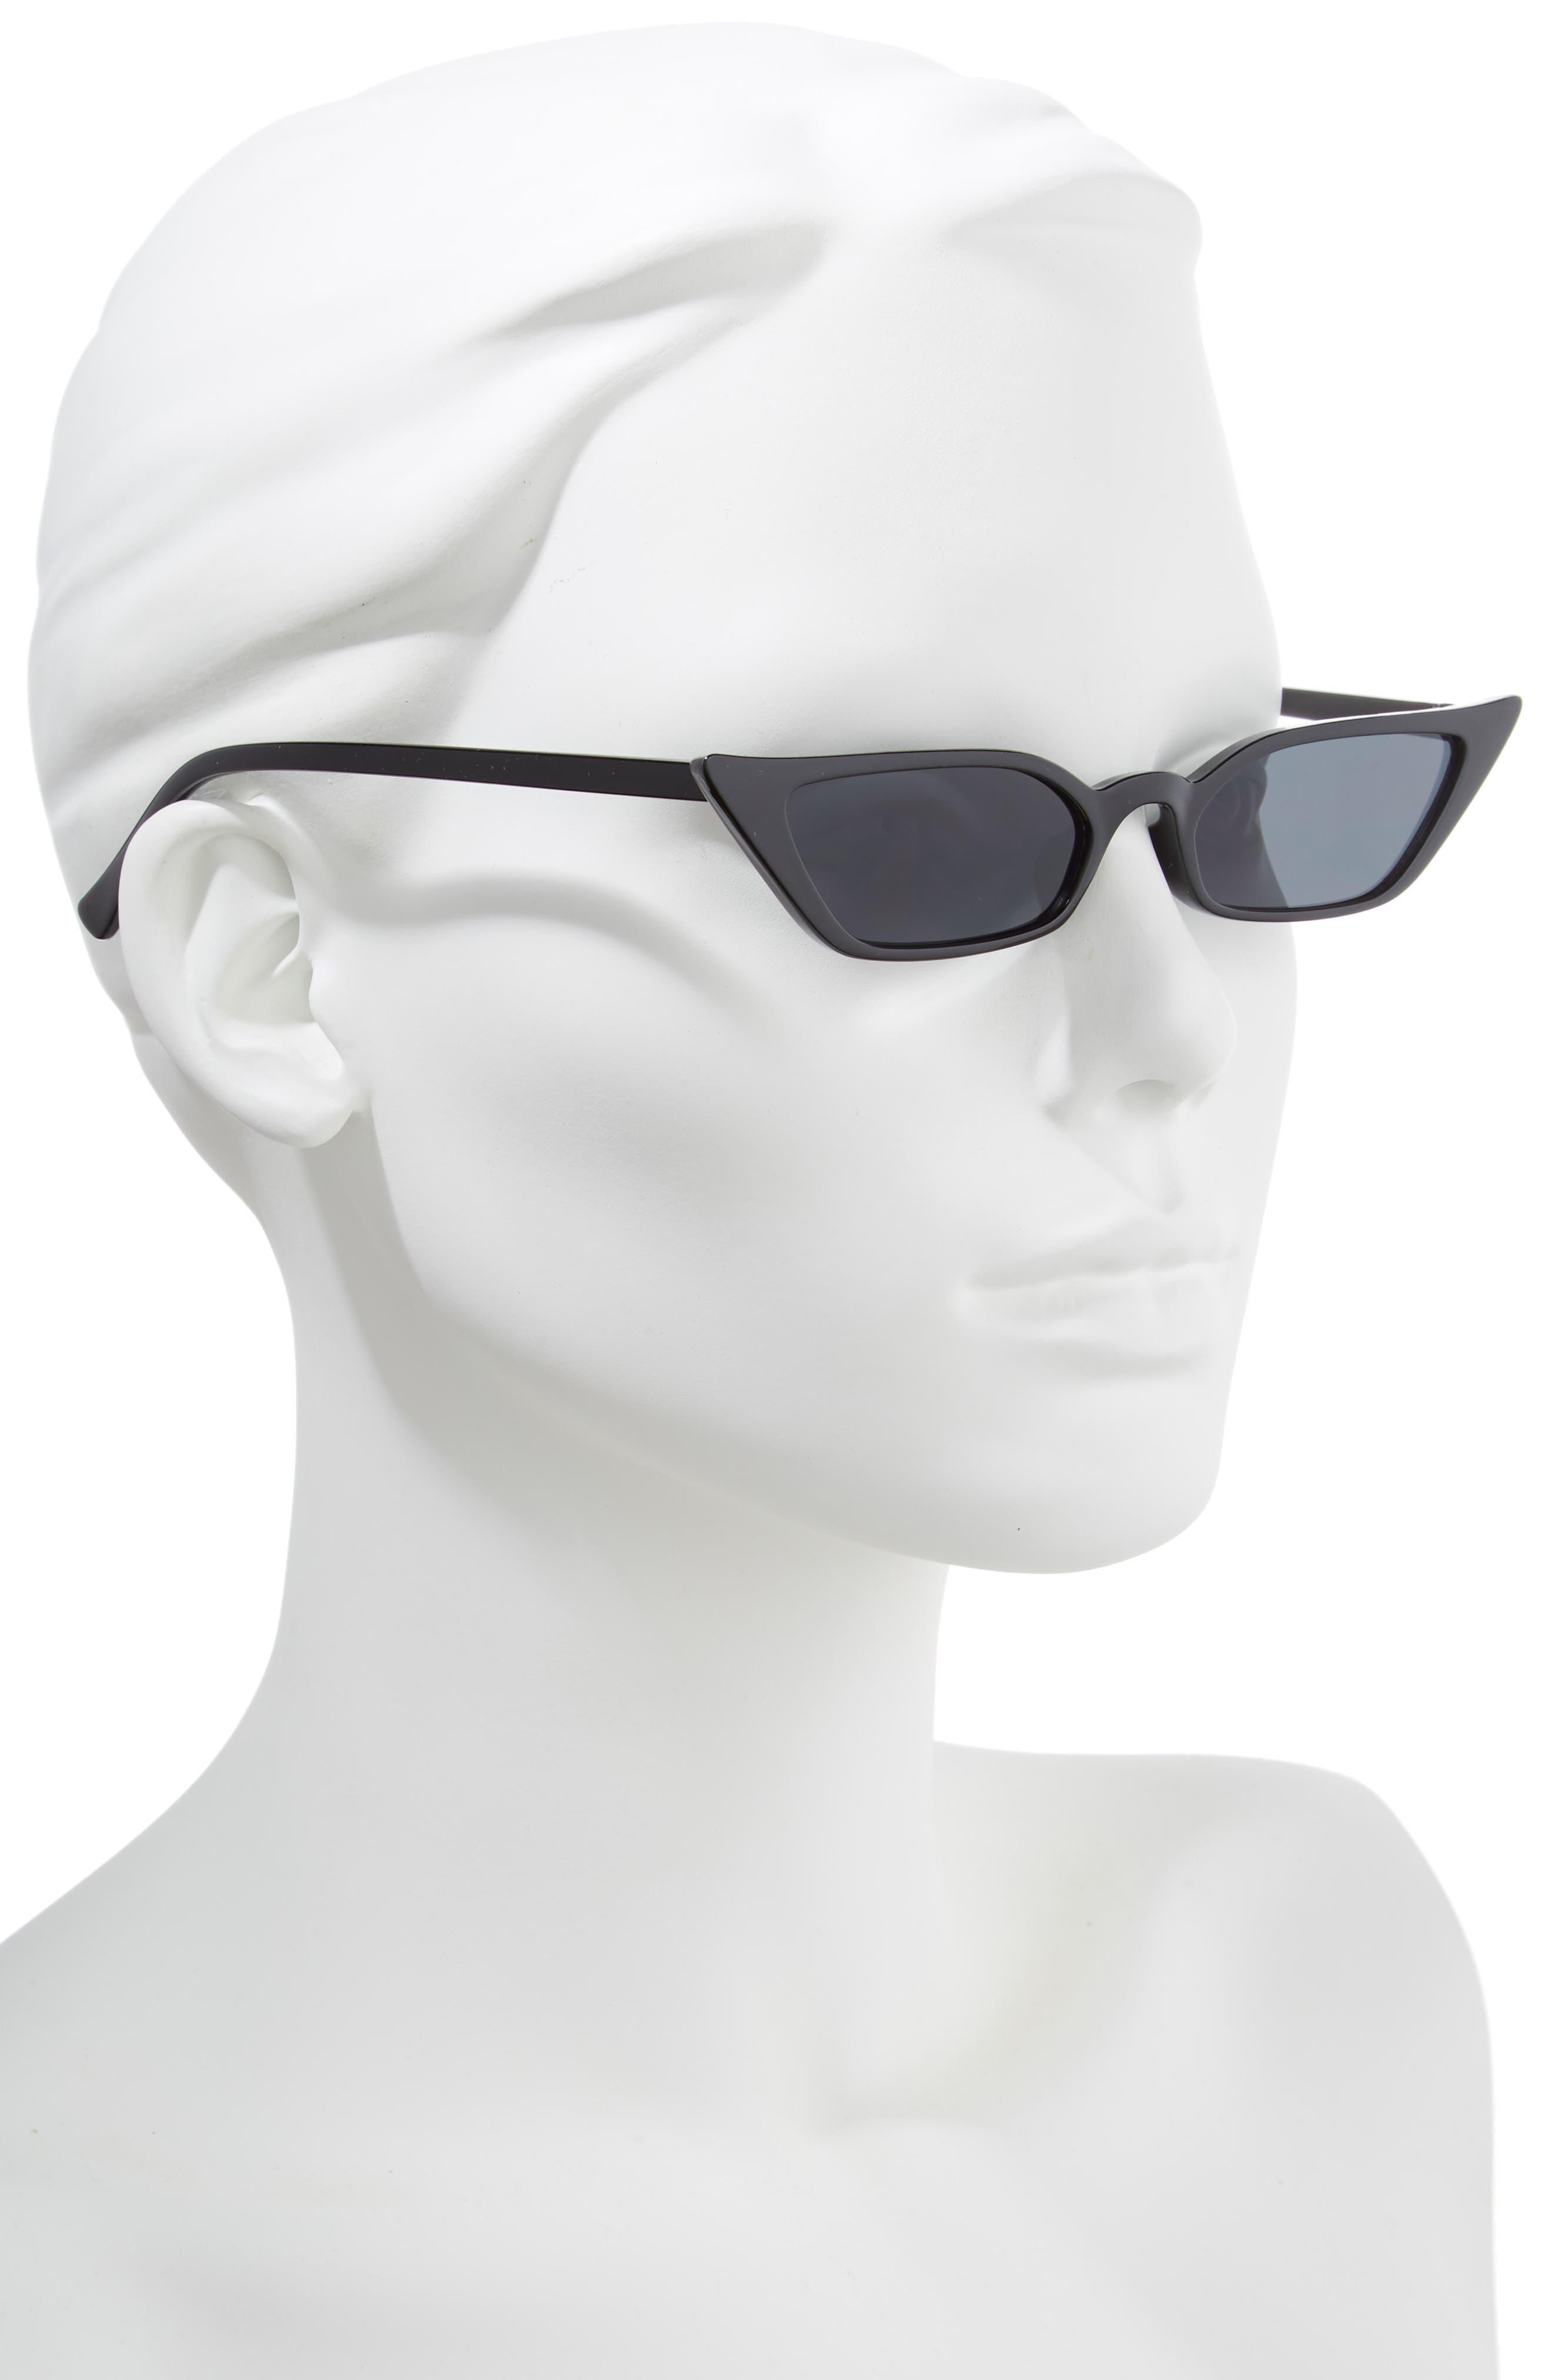 52mm Cat Eye Sunglasses,                             Alternate thumbnail 2, color,                             BLACK/ SMOKE LENS